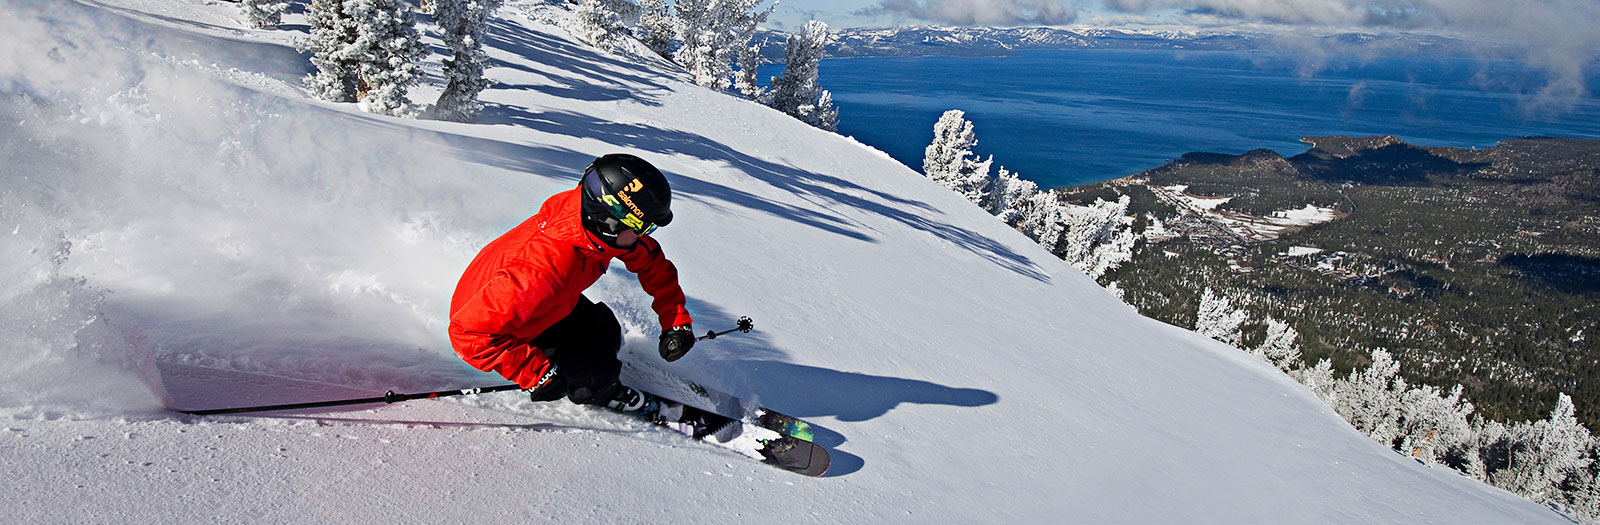 Heavenly Ski Resort vacation packages